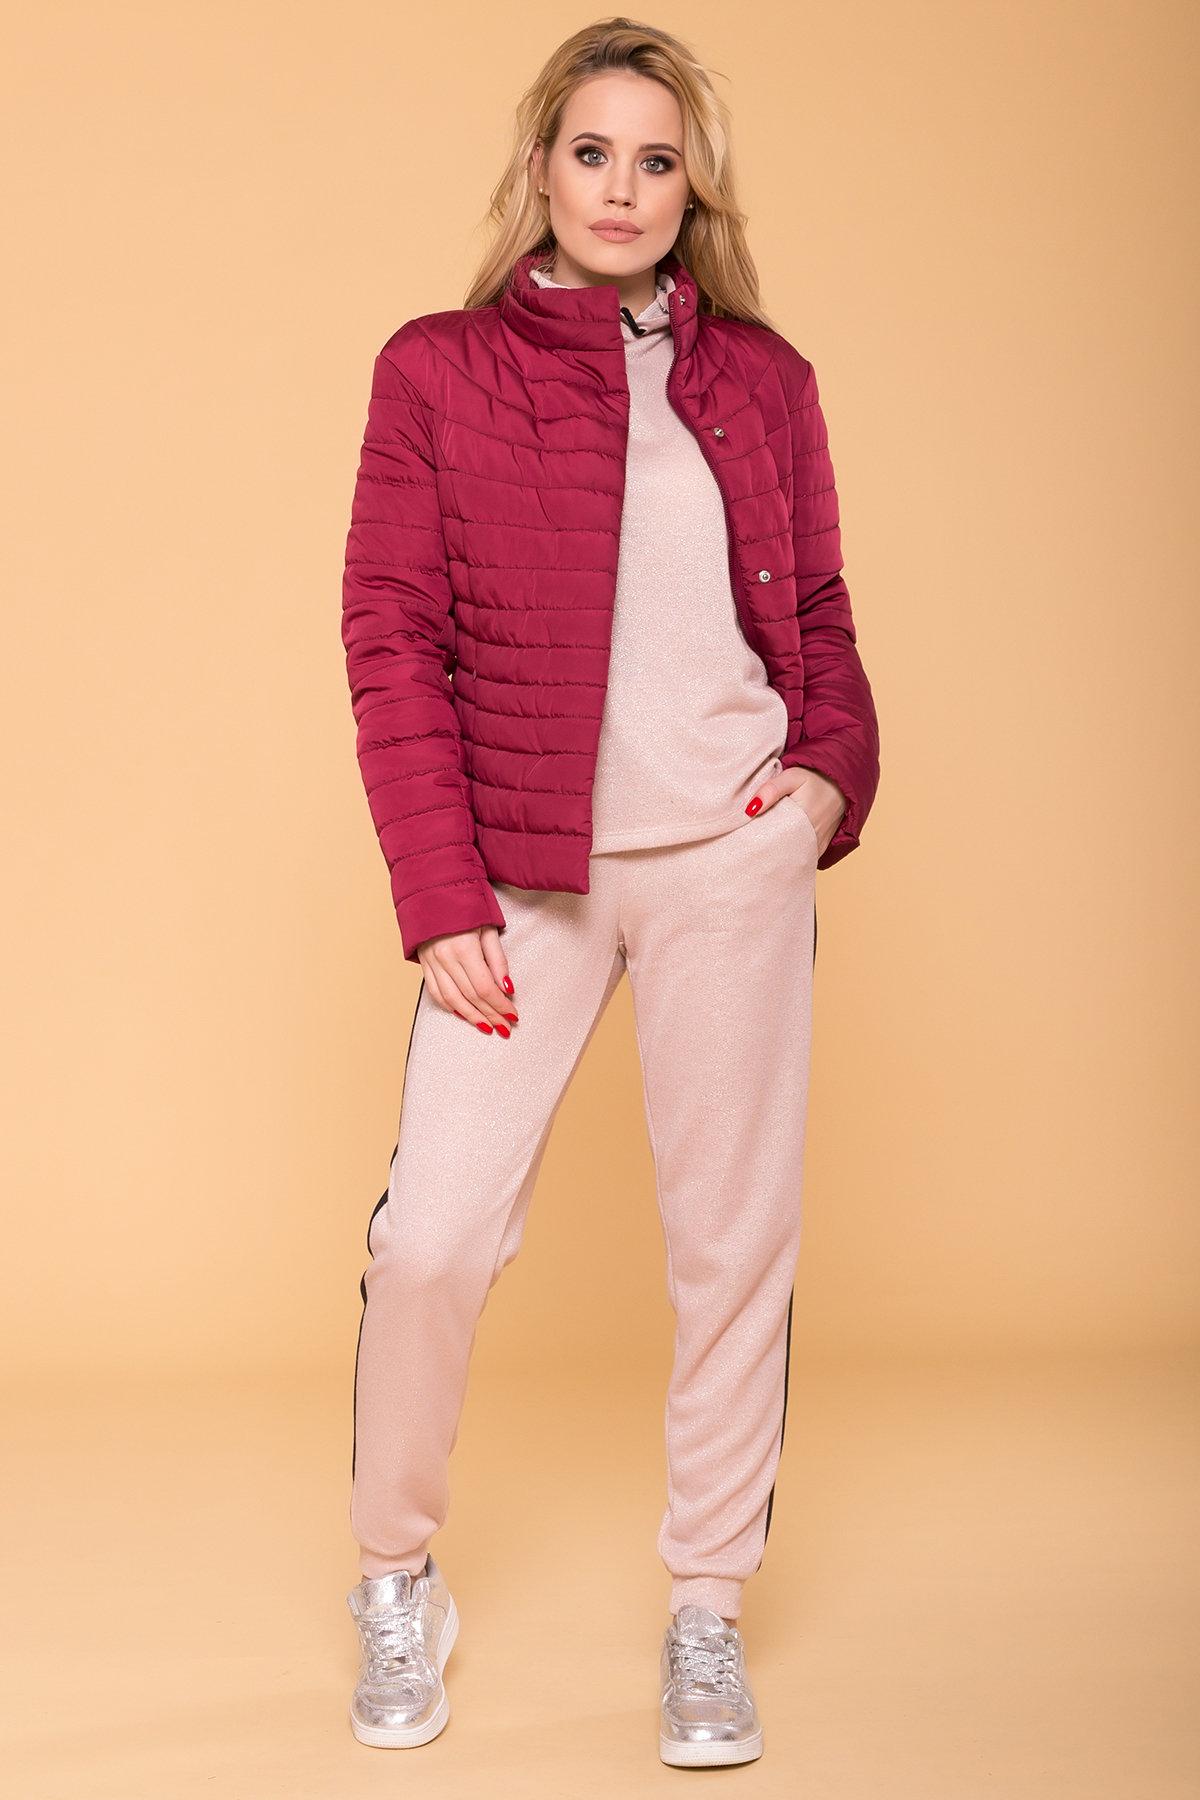 Куртка Флориса лайт 6416 АРТ. 41338 Цвет: Марсала - фото 3, интернет магазин tm-modus.ru